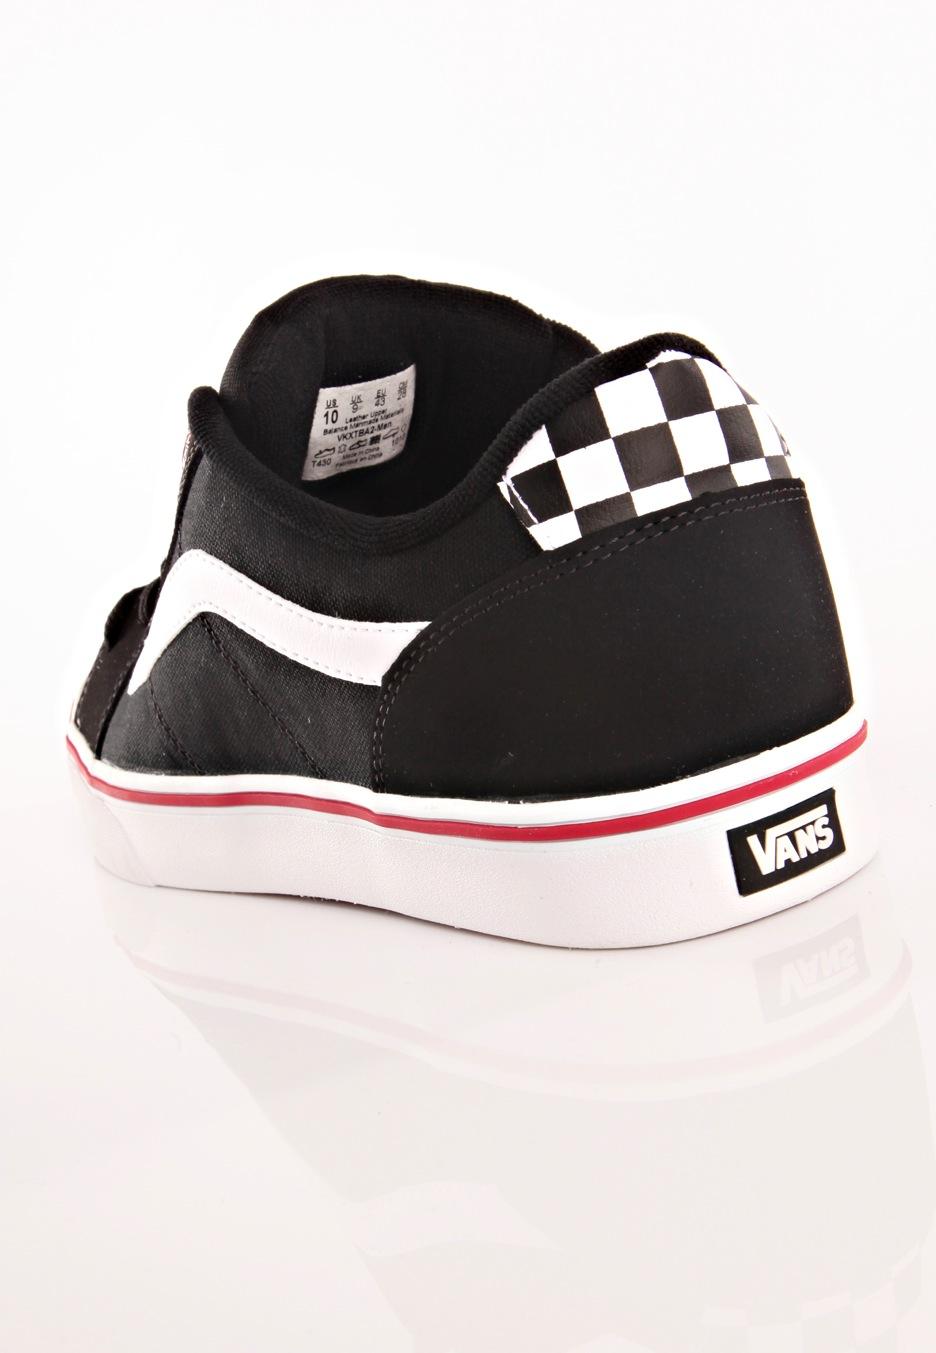 f3f66f615b Vans - Transistor Black White - Shoes - Impericon.com UK